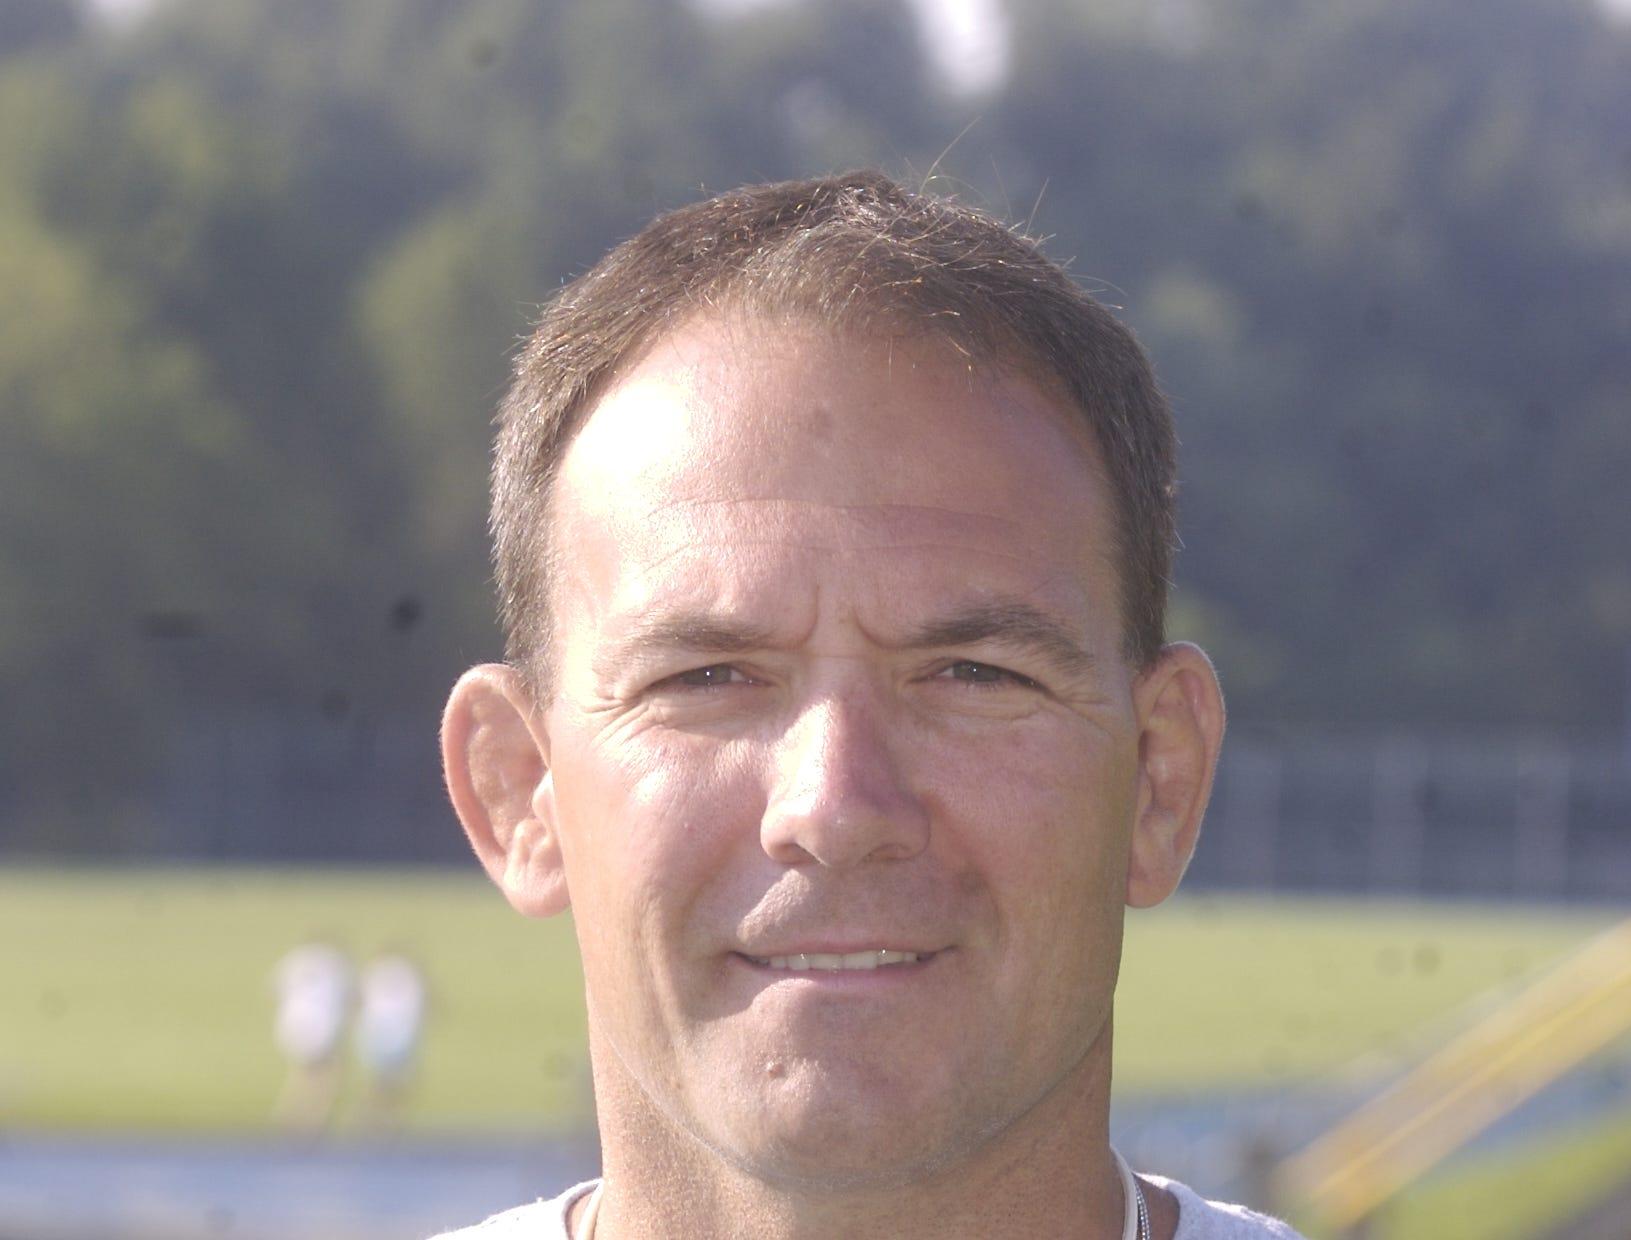 Maine-Endwell football, Head Coach Matt Gallagher, 2009